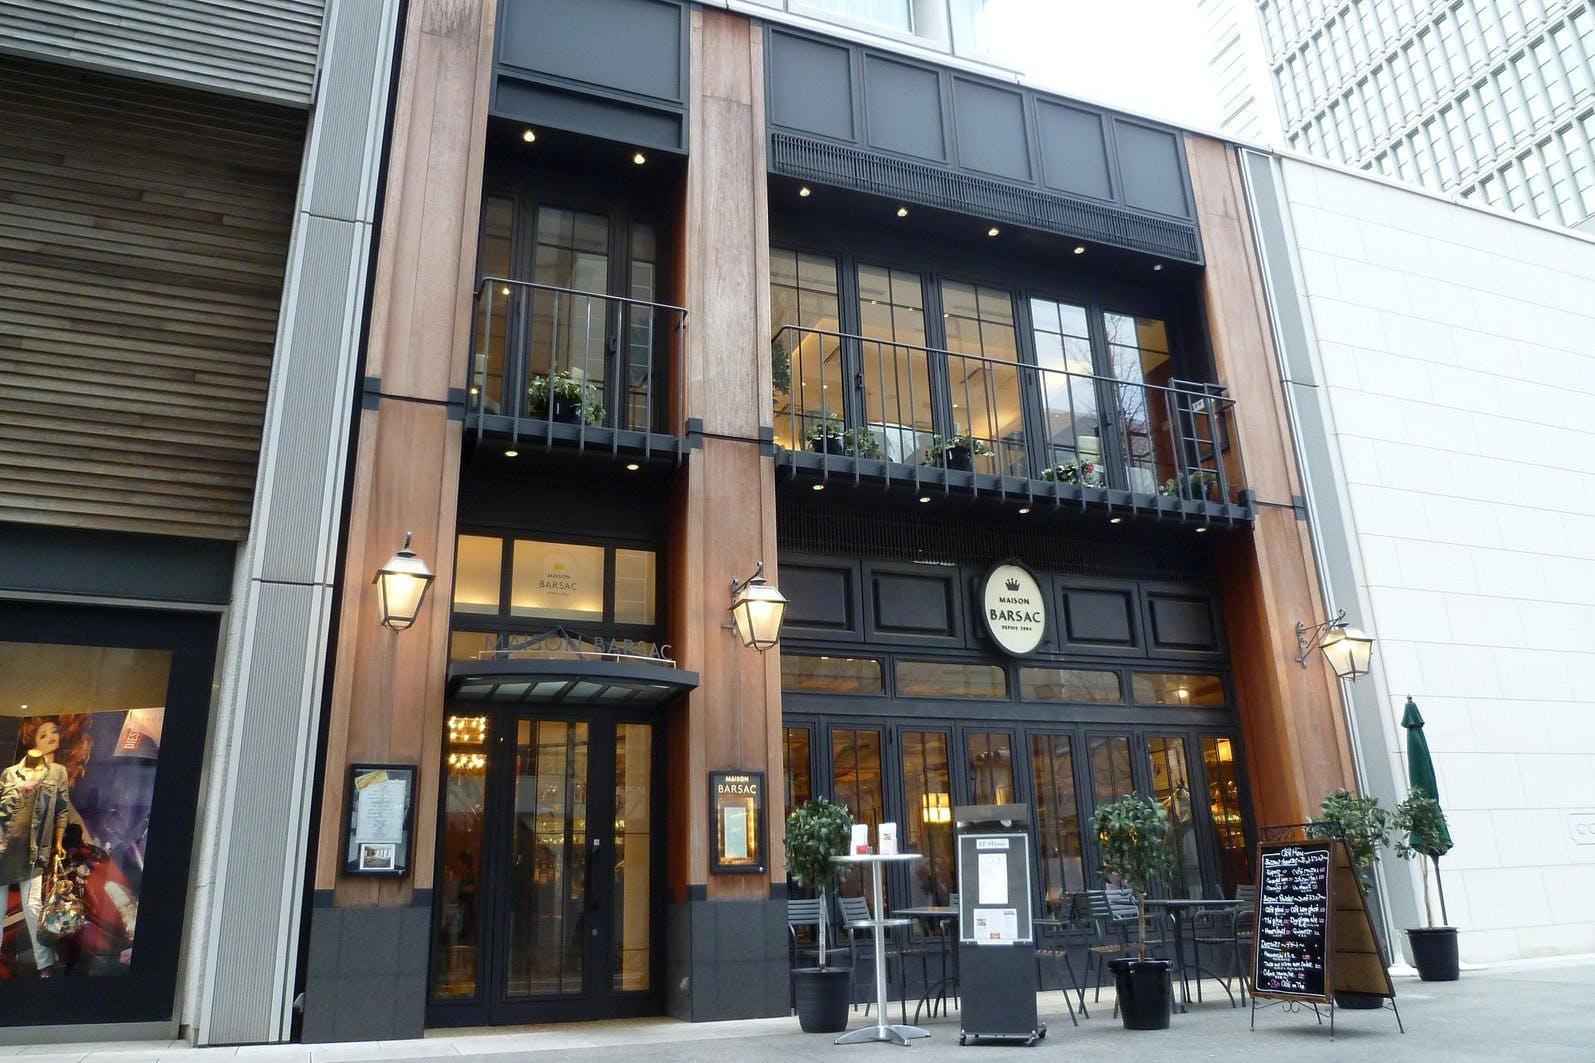 French & Cafe Maison Barsac (メゾン バルサック)【1F】